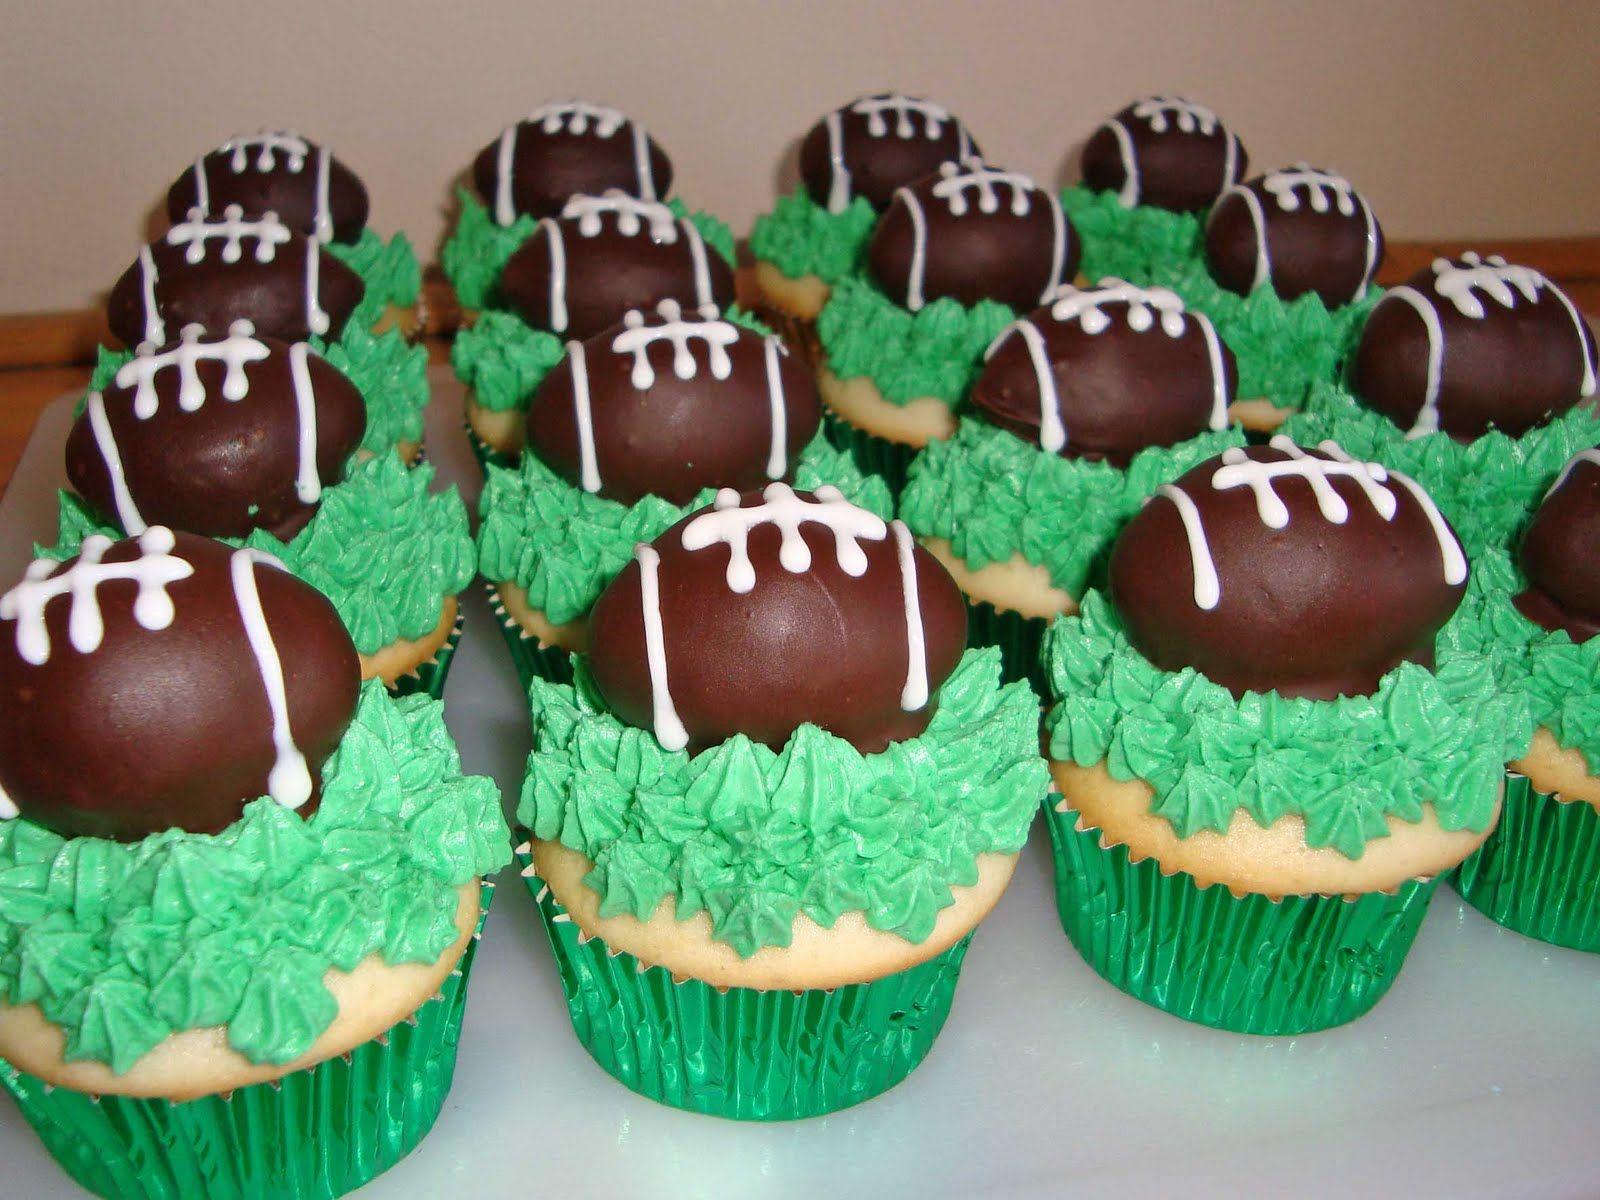 Cake Decorating Ideas Football Themed Birthday Cake And Cupcake